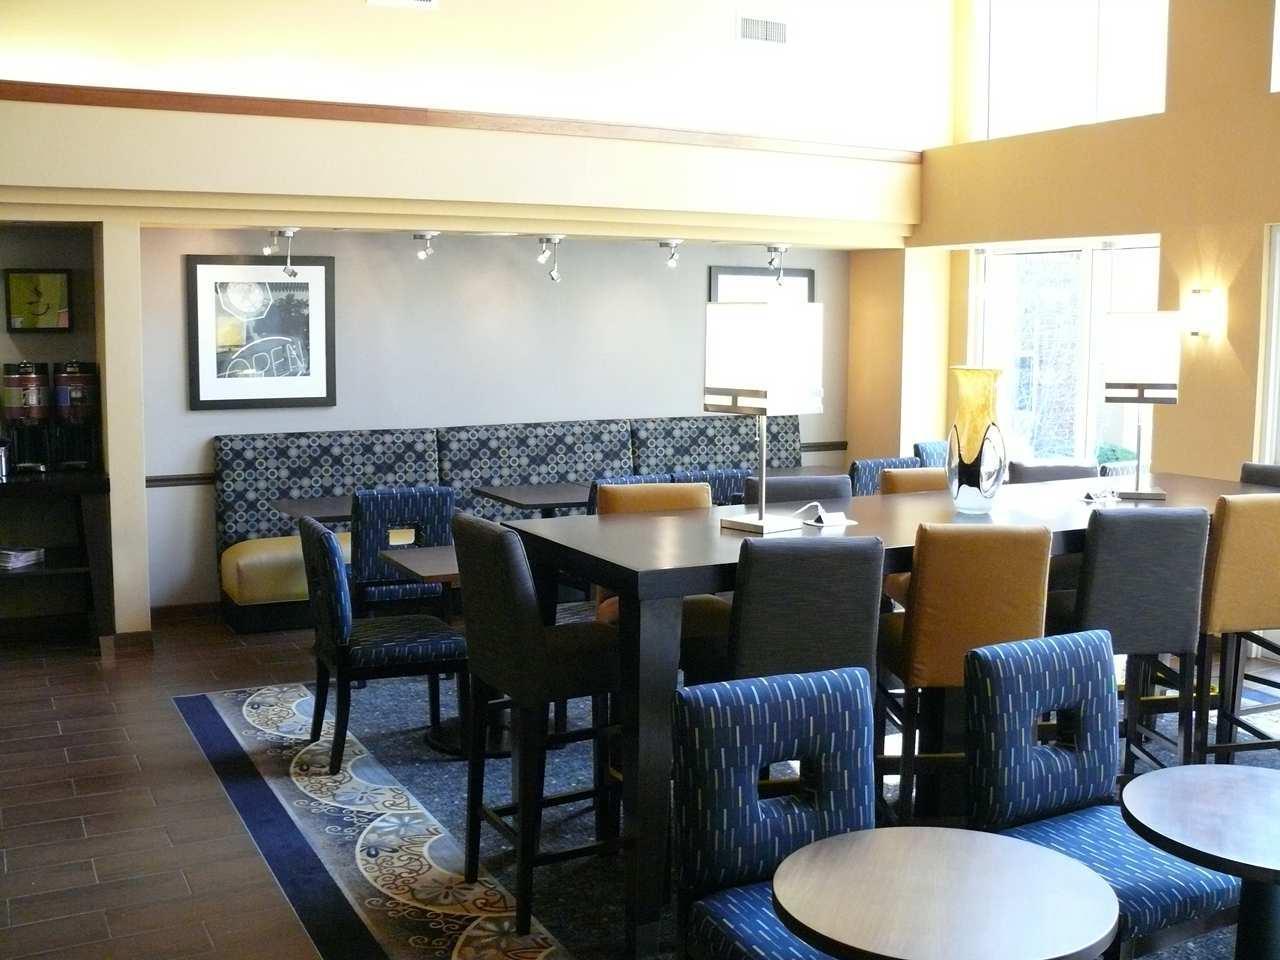 Hampton Inn & Suites Chicago/Hoffman Estates image 4